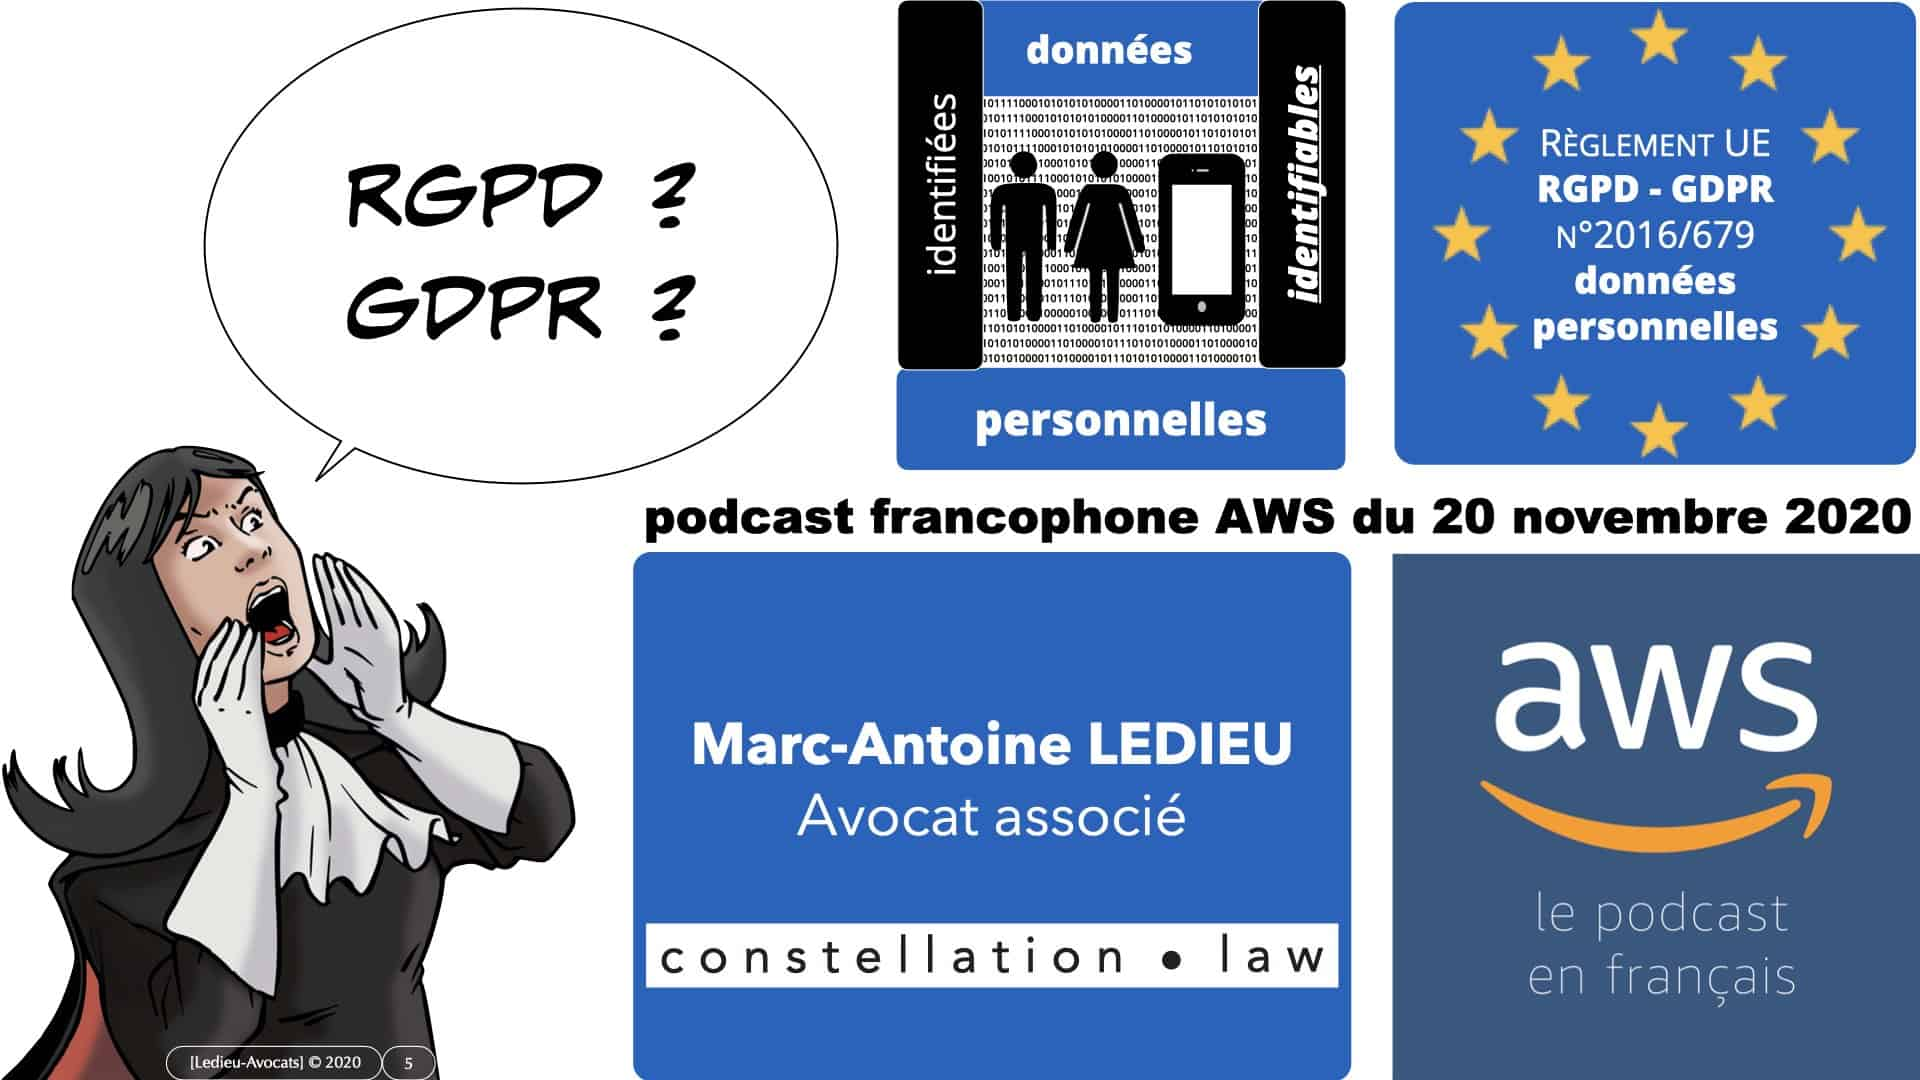 312 AWS PODCAST RGPD [20-11-2020] *16:9* © Ledieu-Avocats 20-11-2020.005